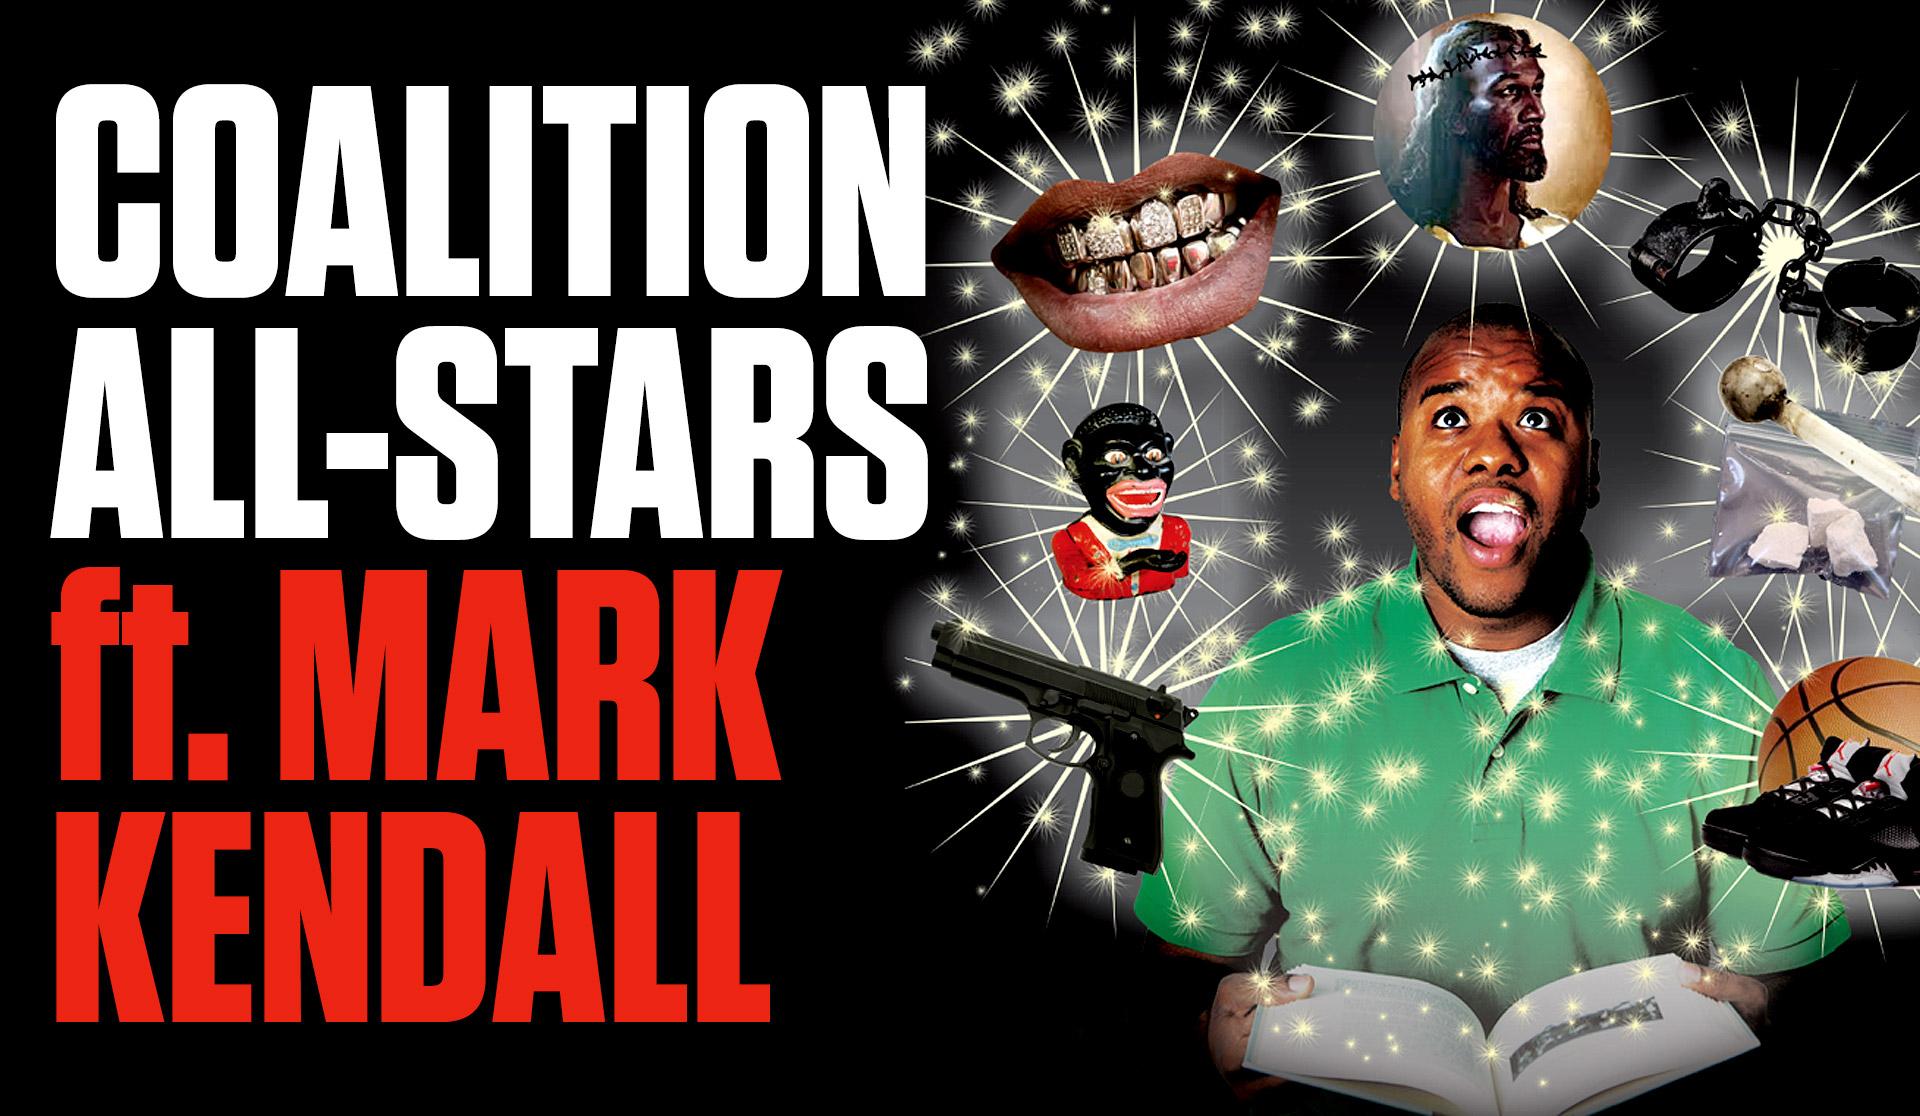 Coalition All-Stars ft. Mark Kendall